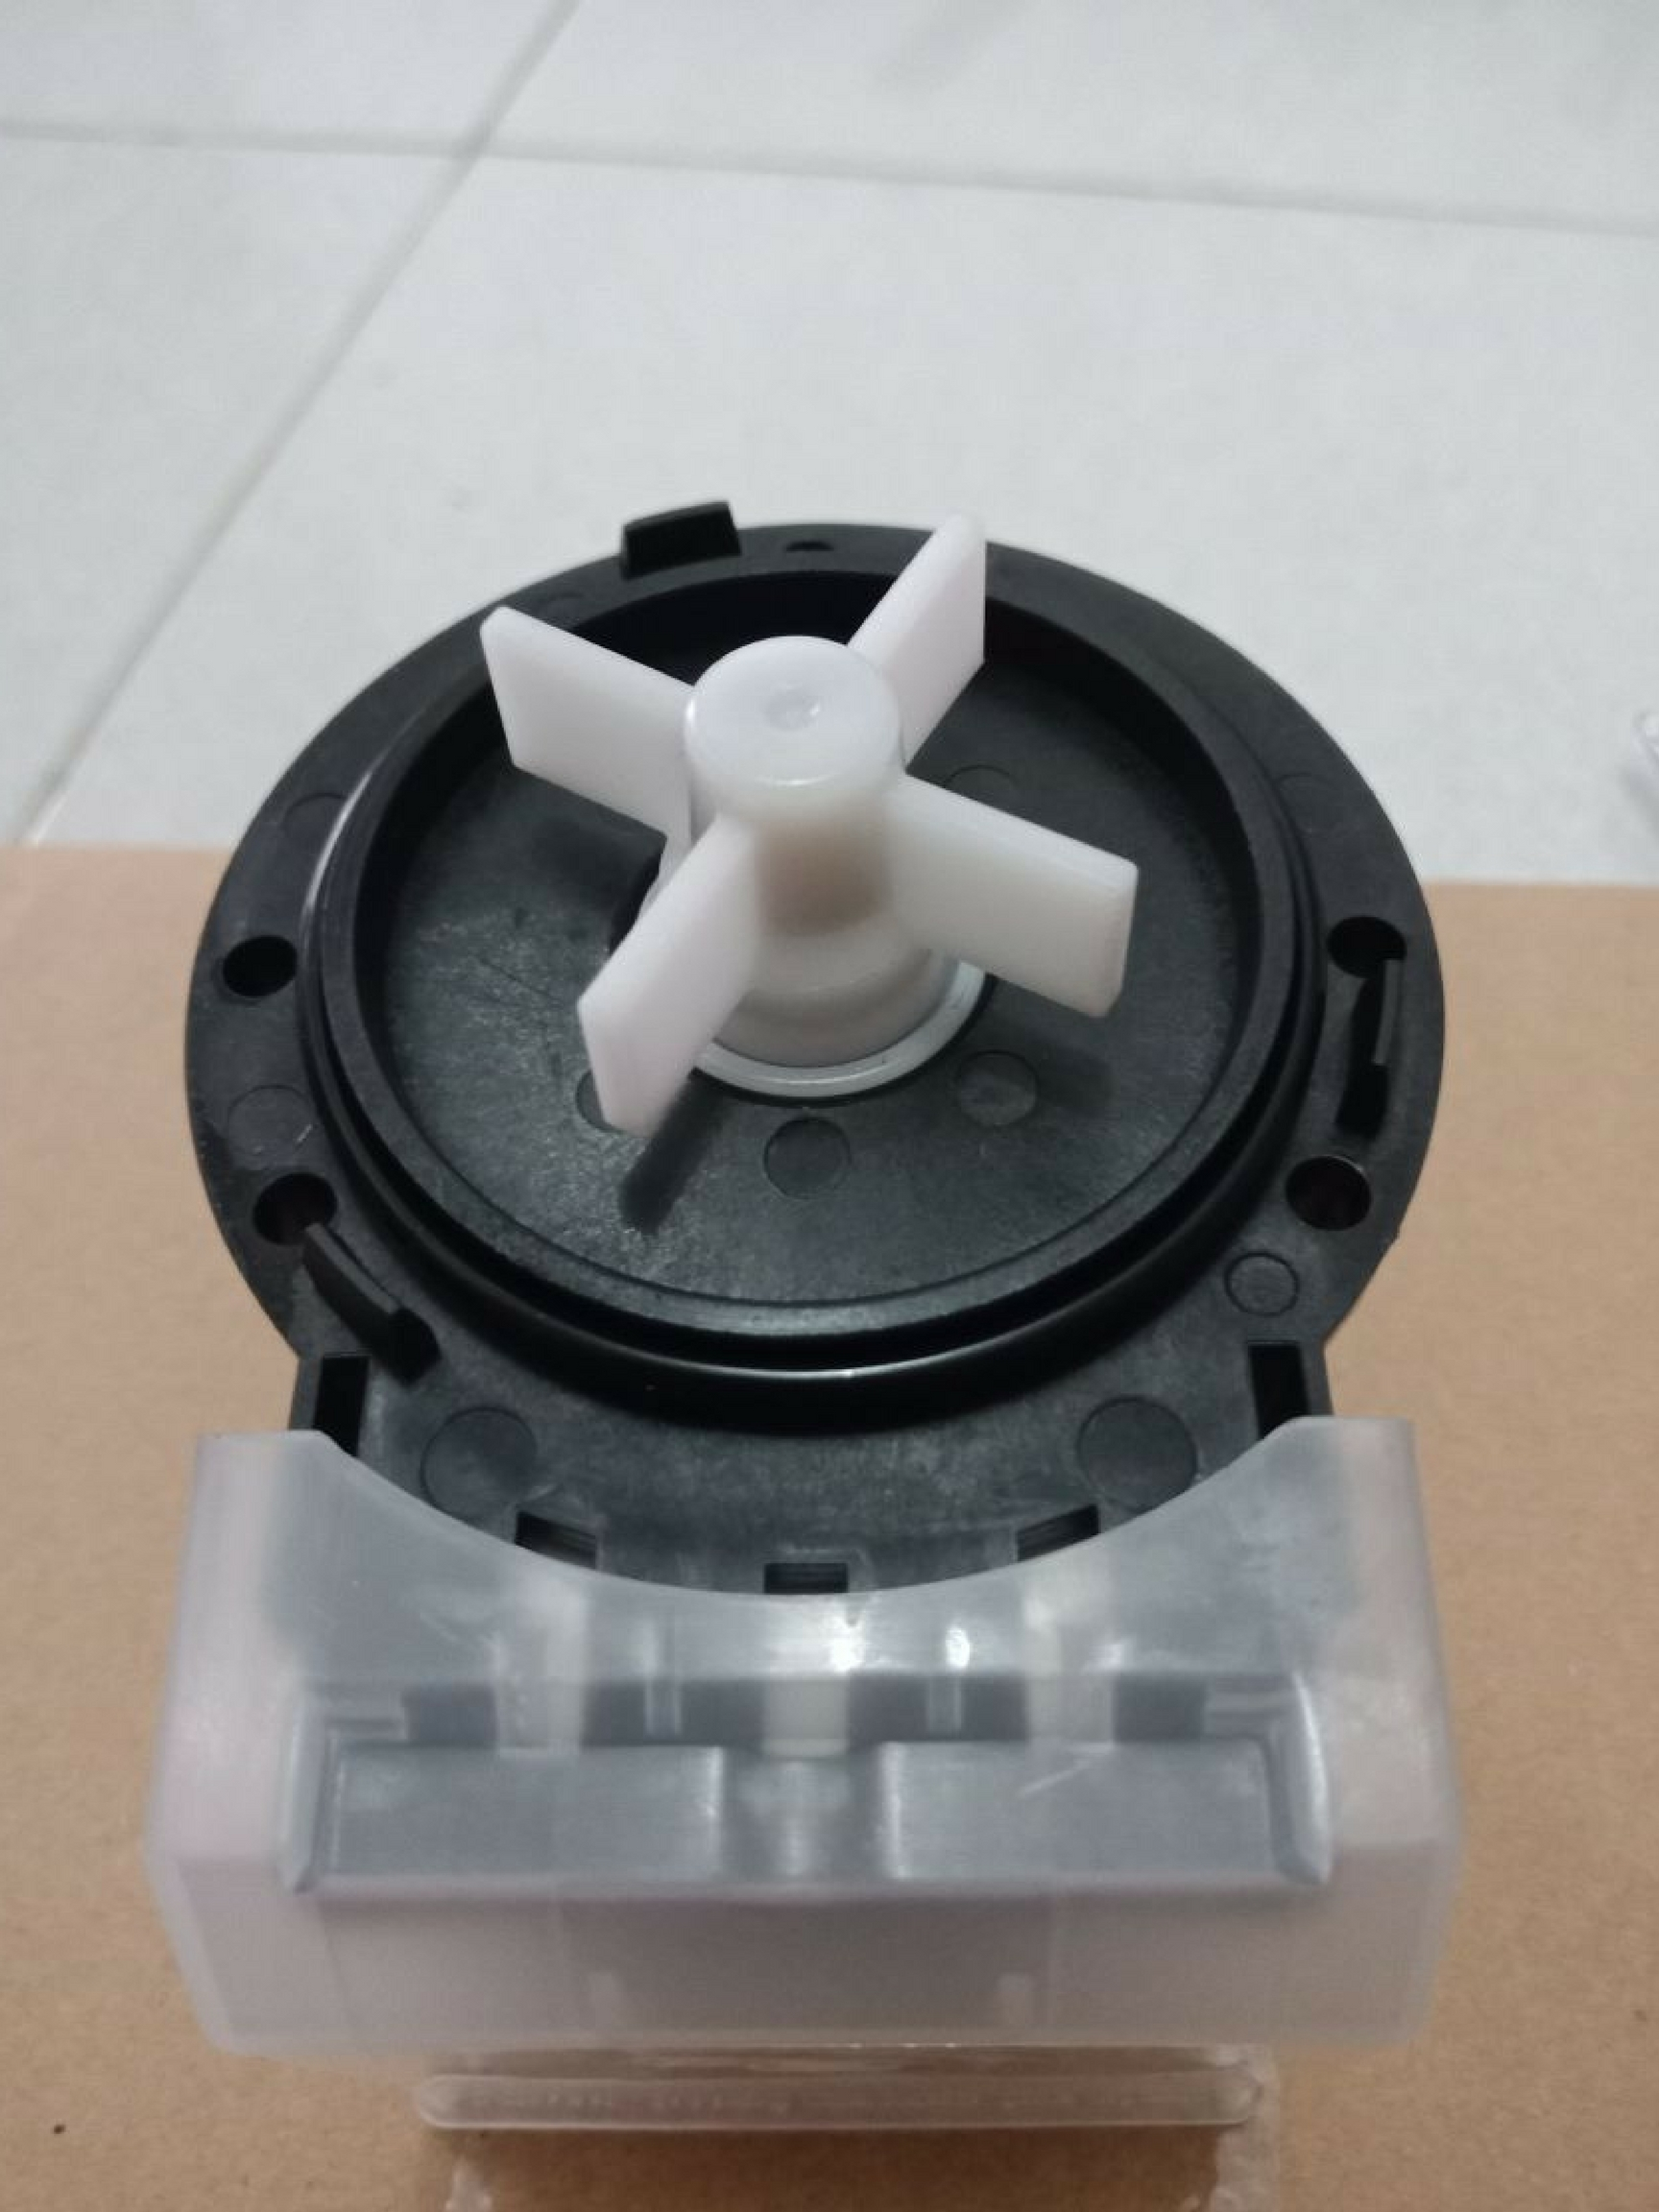 Jual Motor Drain Pump Mesin Cuci Frontloading Lg Wd M8070td F1007nppw K8070tp Alfariel Part Electronic Tokopedia